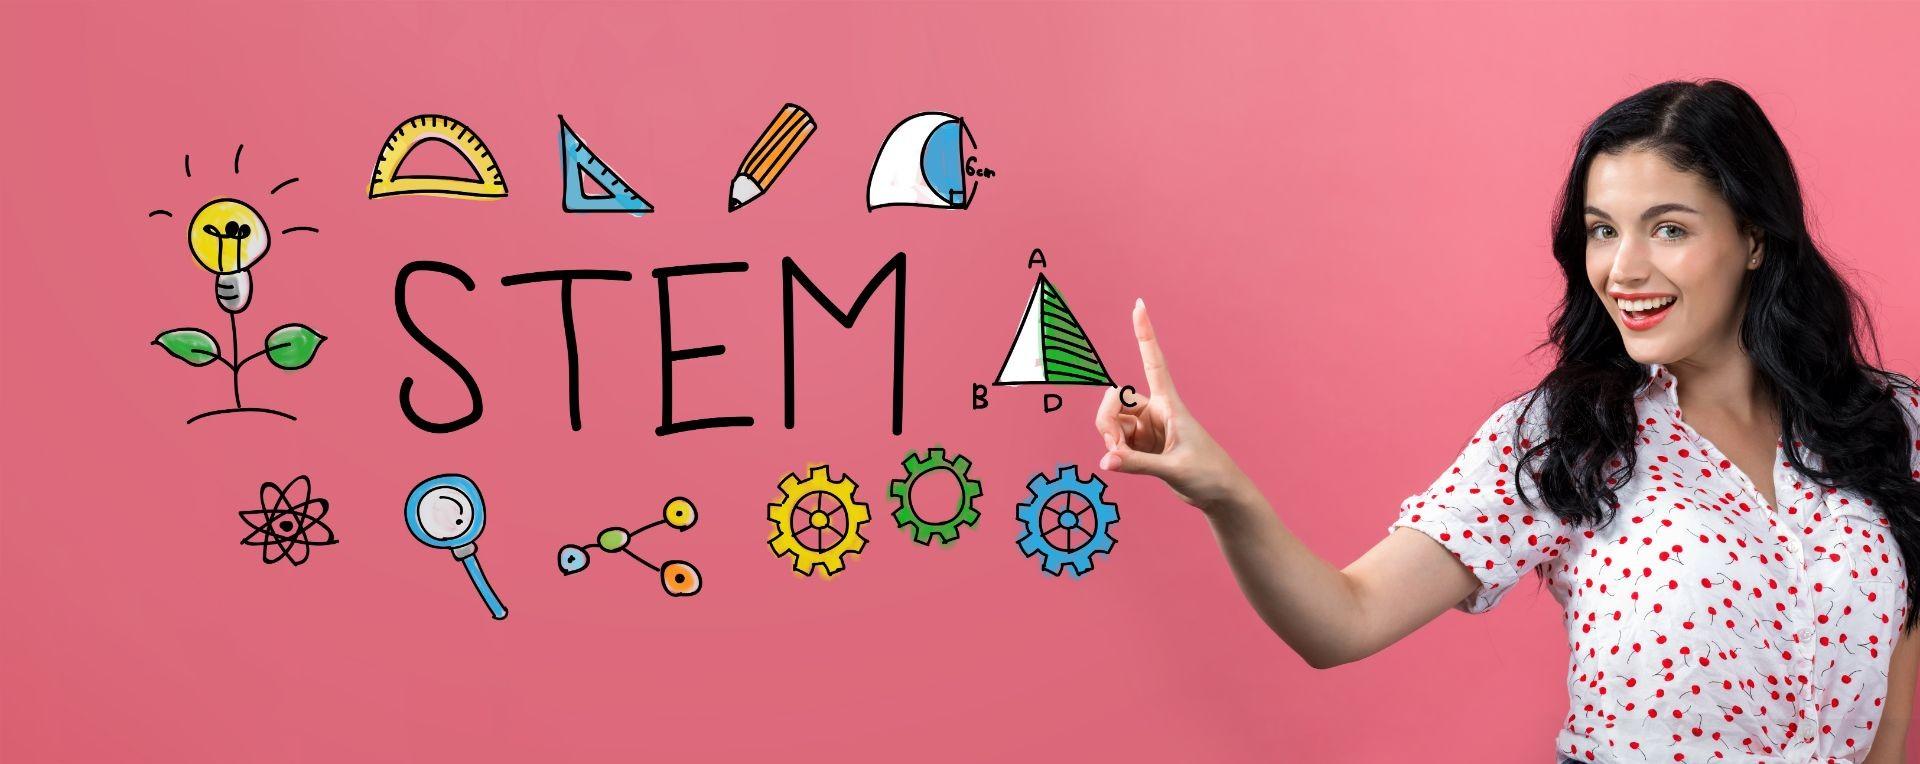 Mujer pulsando palabra STEM